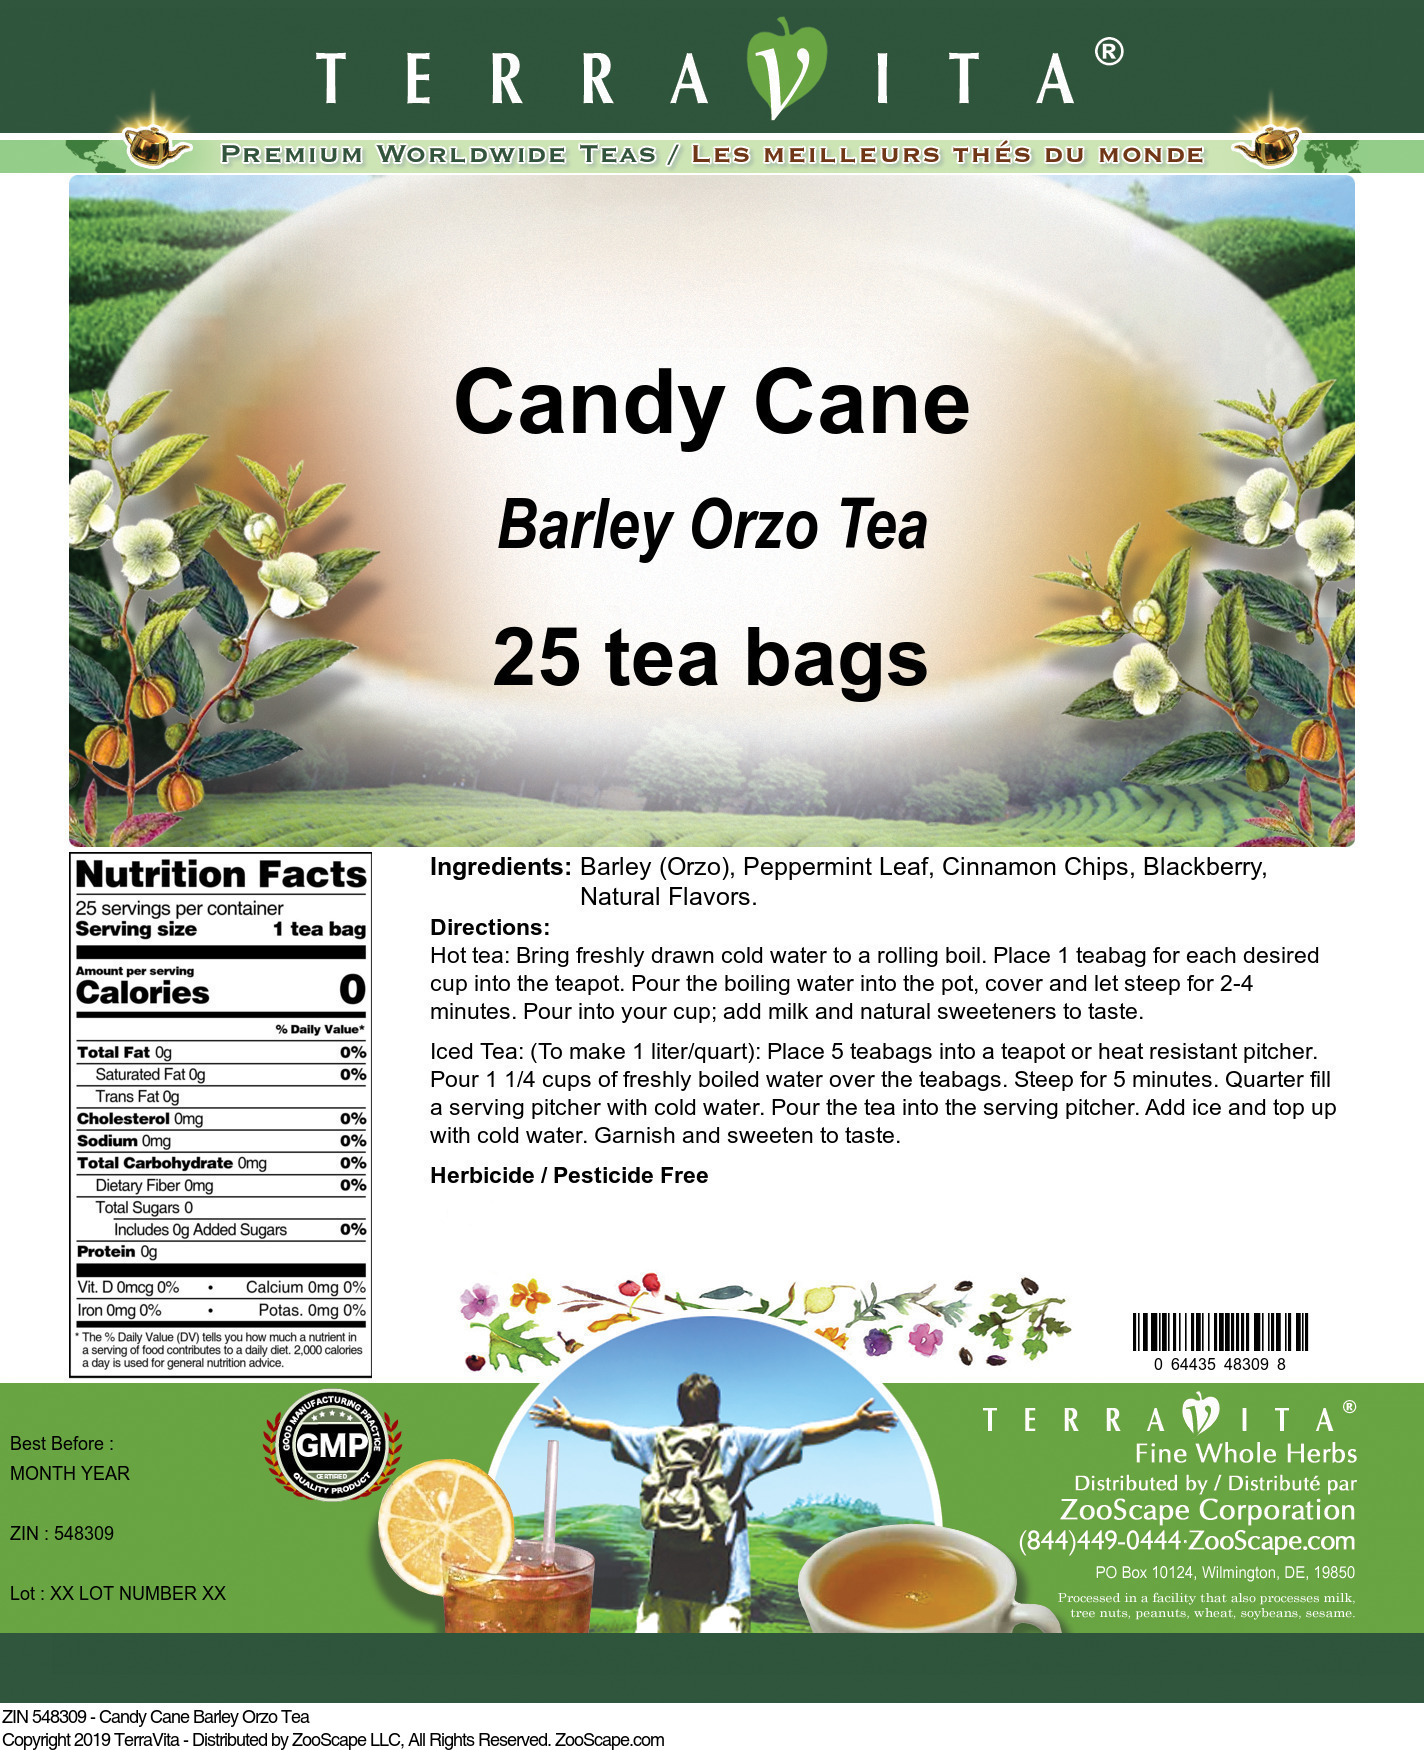 Candy Cane Barley Orzo Tea